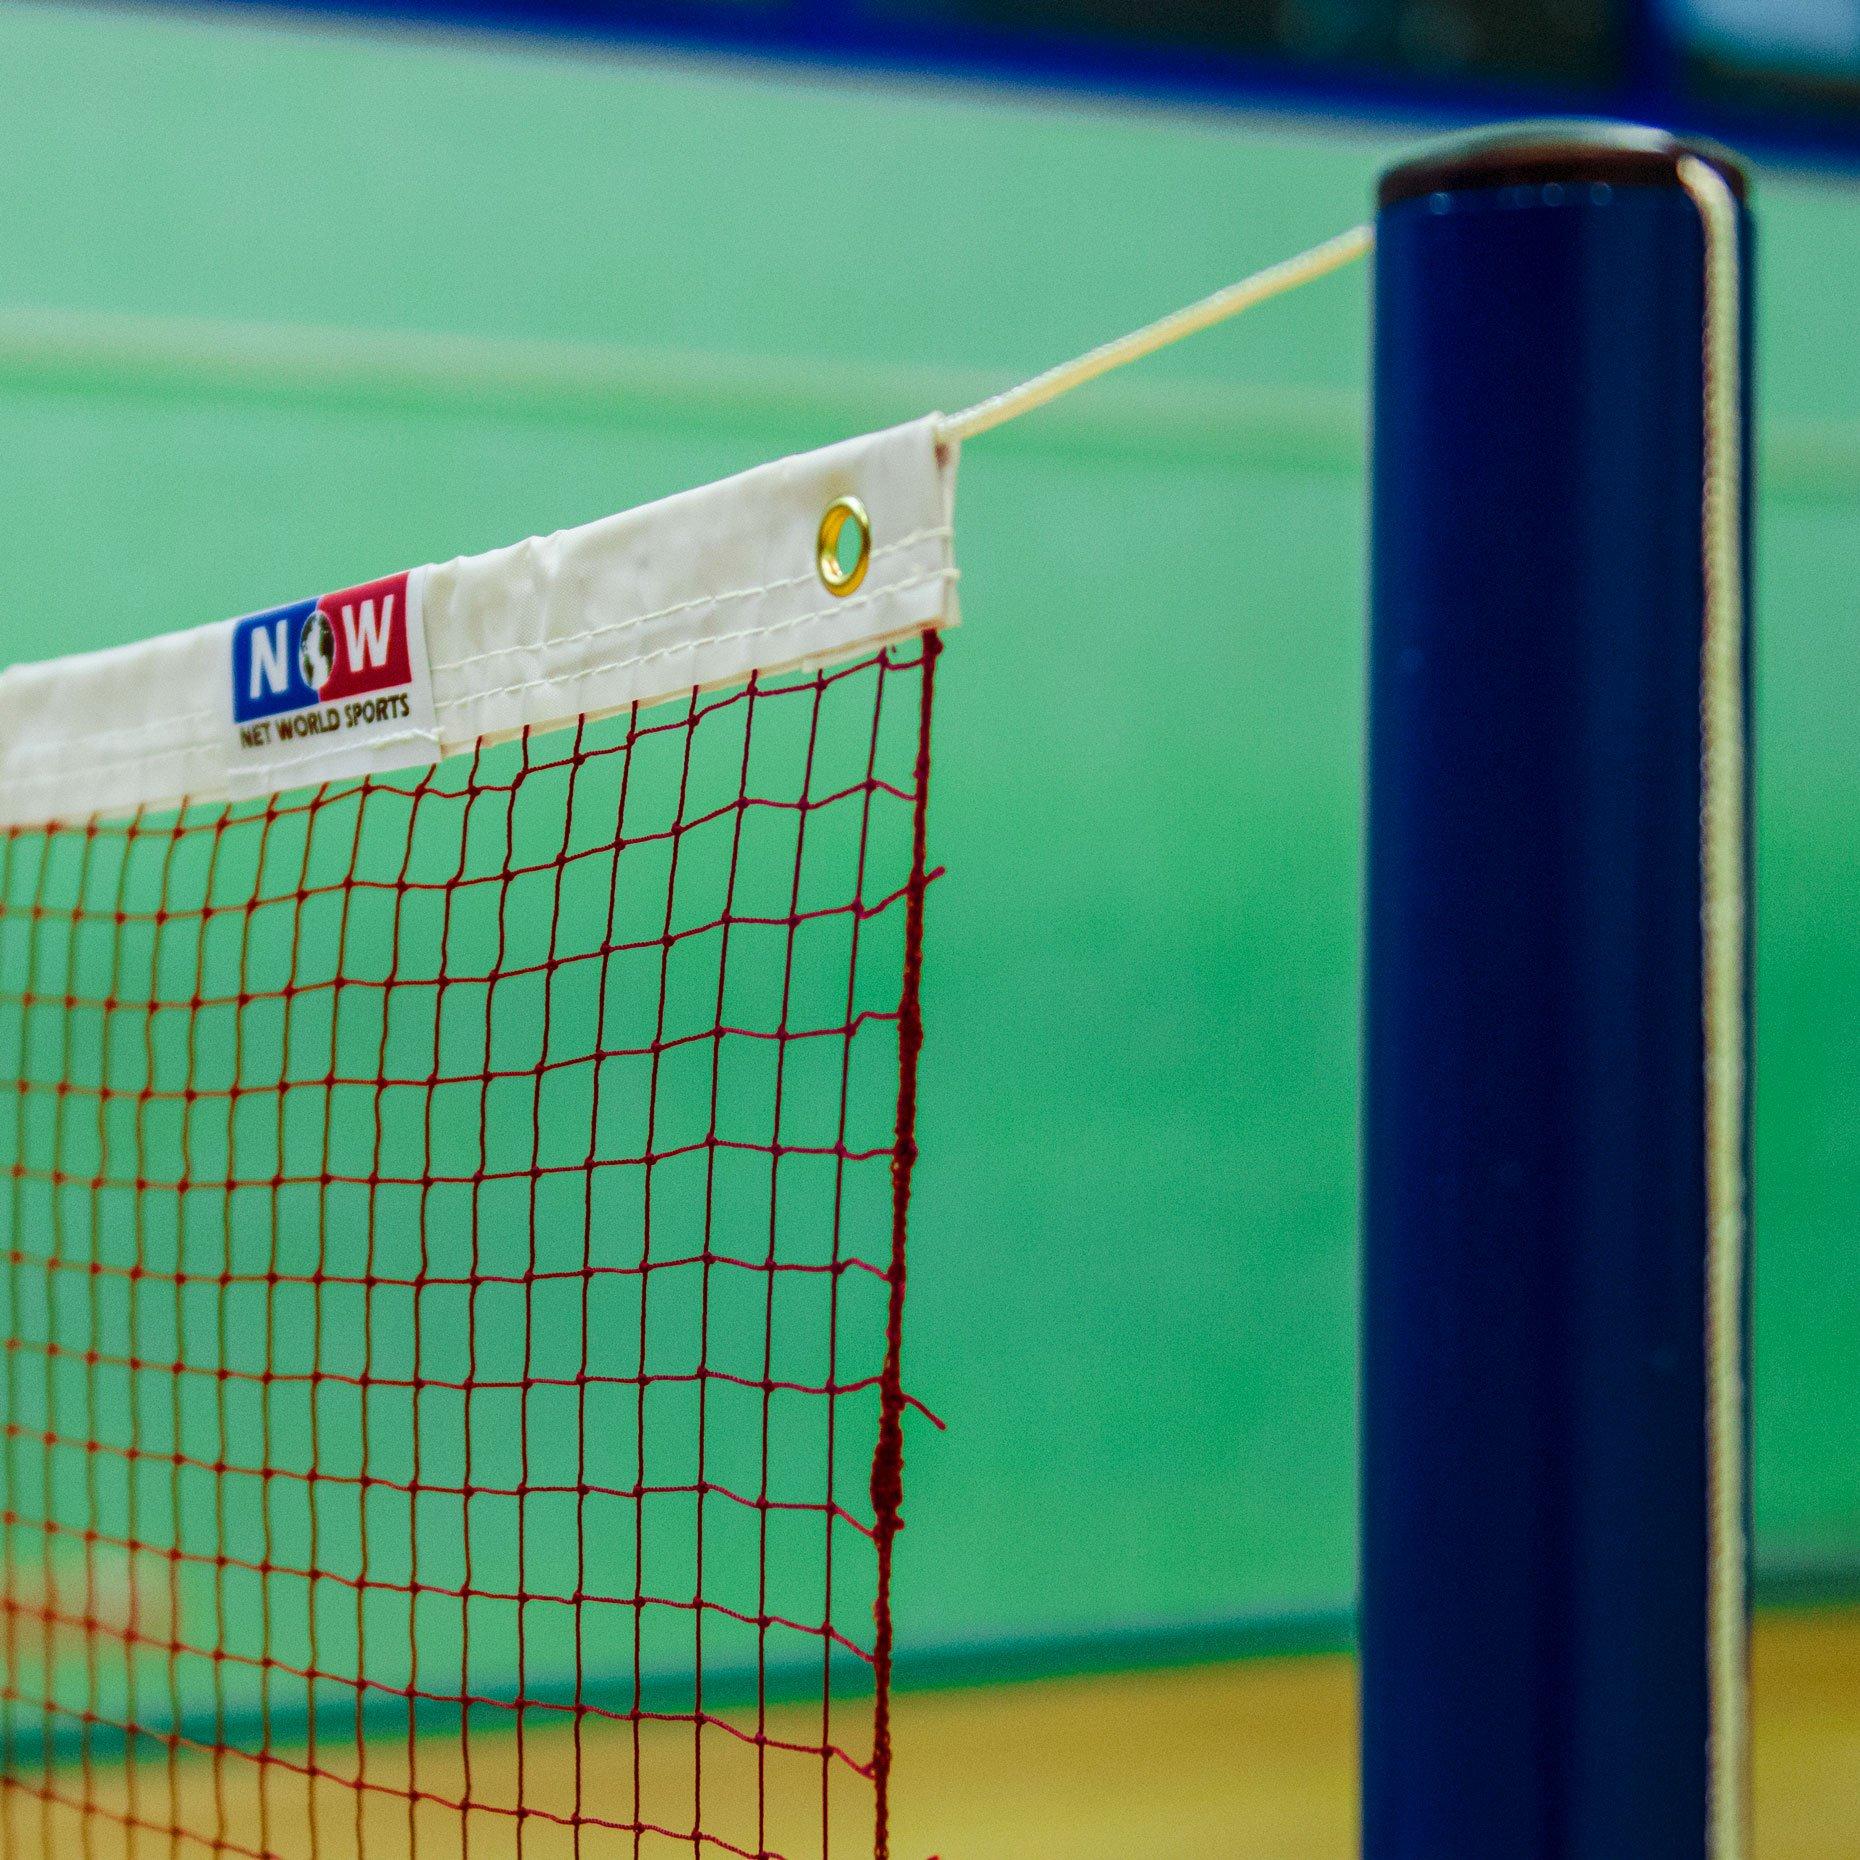 Badminton Net - Regulation 24ft Professional Net [Net World Sports] by Net World Sports